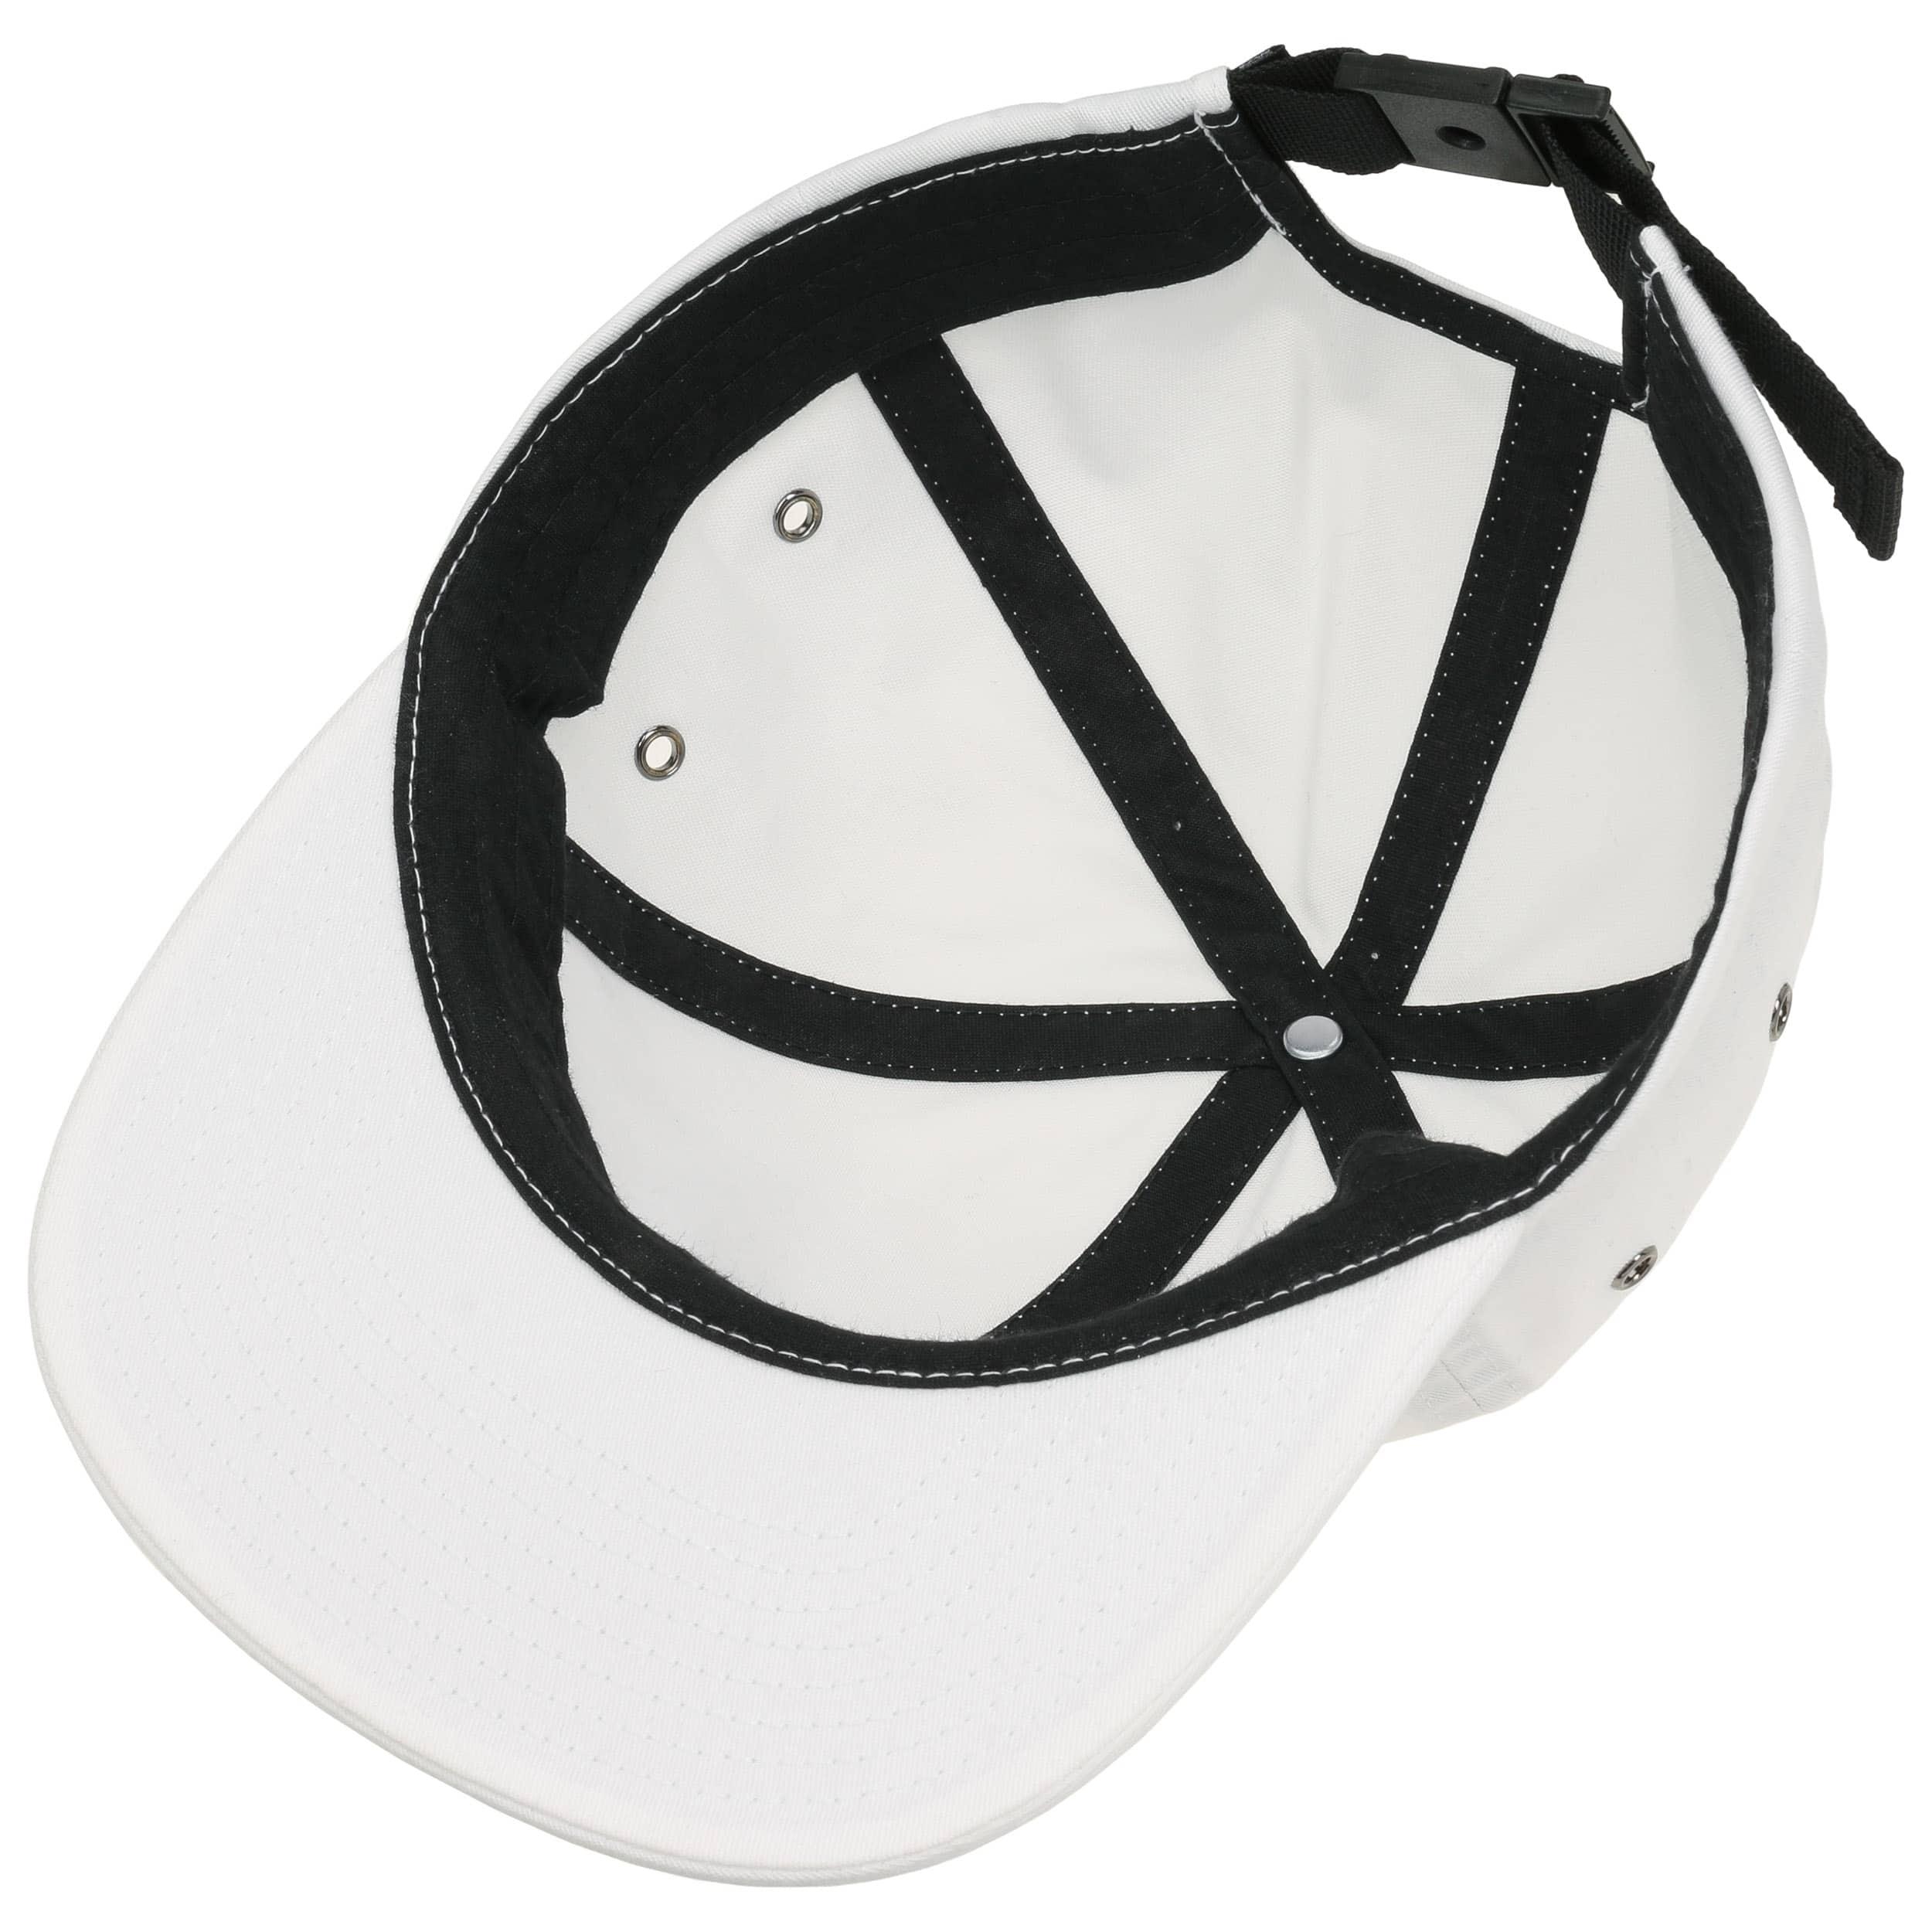 45378c26 Just Waving Jock Strapback Cap by Vans, EUR 24,95 --> Hats, caps ...